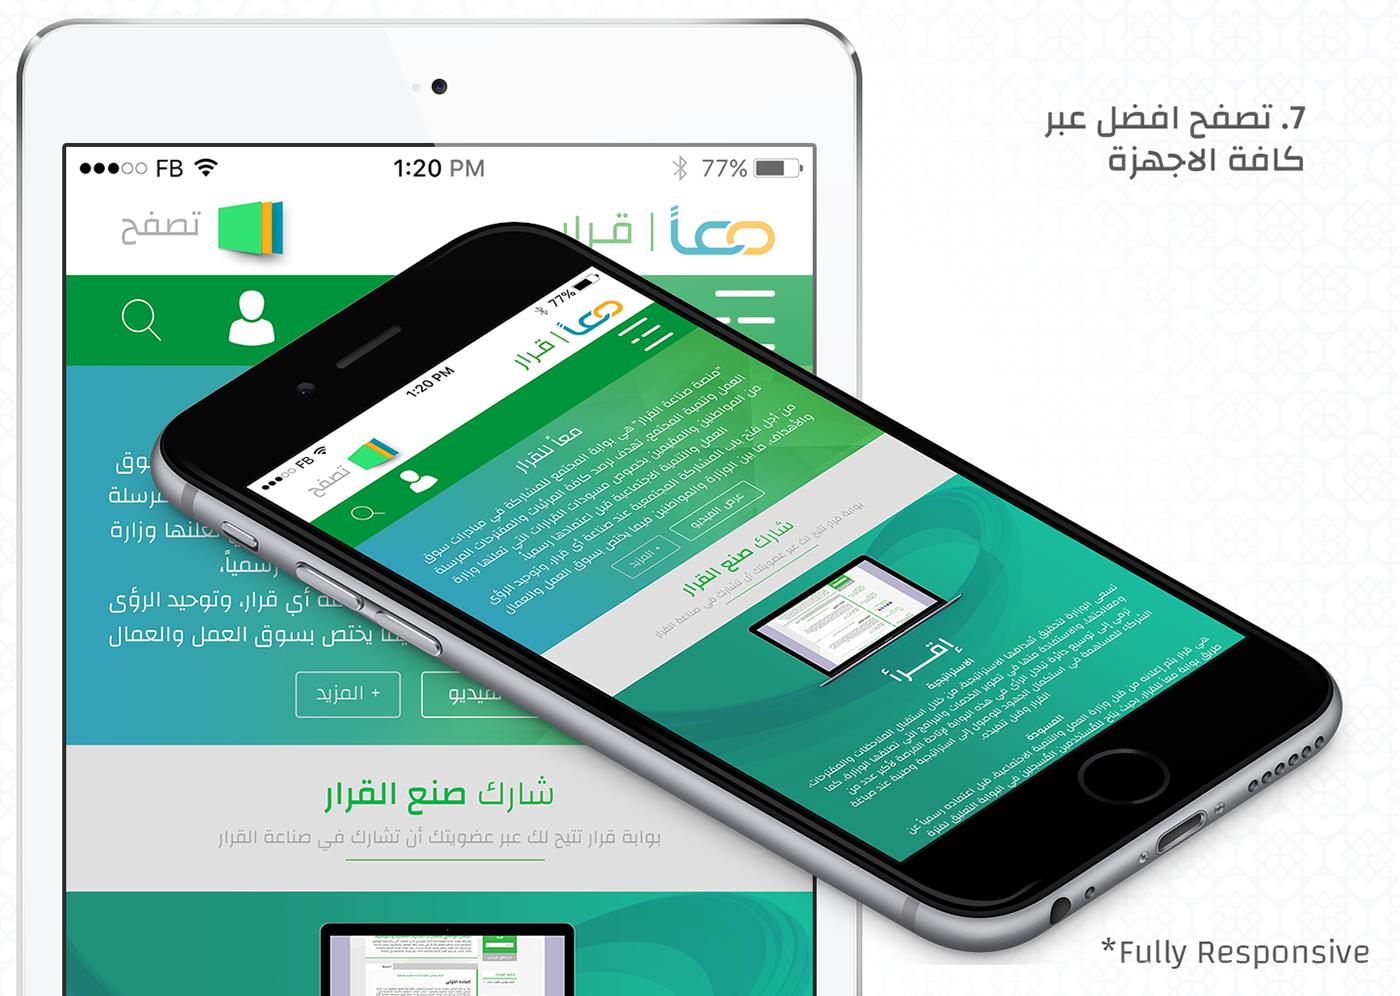 revamp,ui design,UI/UX Design,Government,portal,Website,design,Ministry,KSA